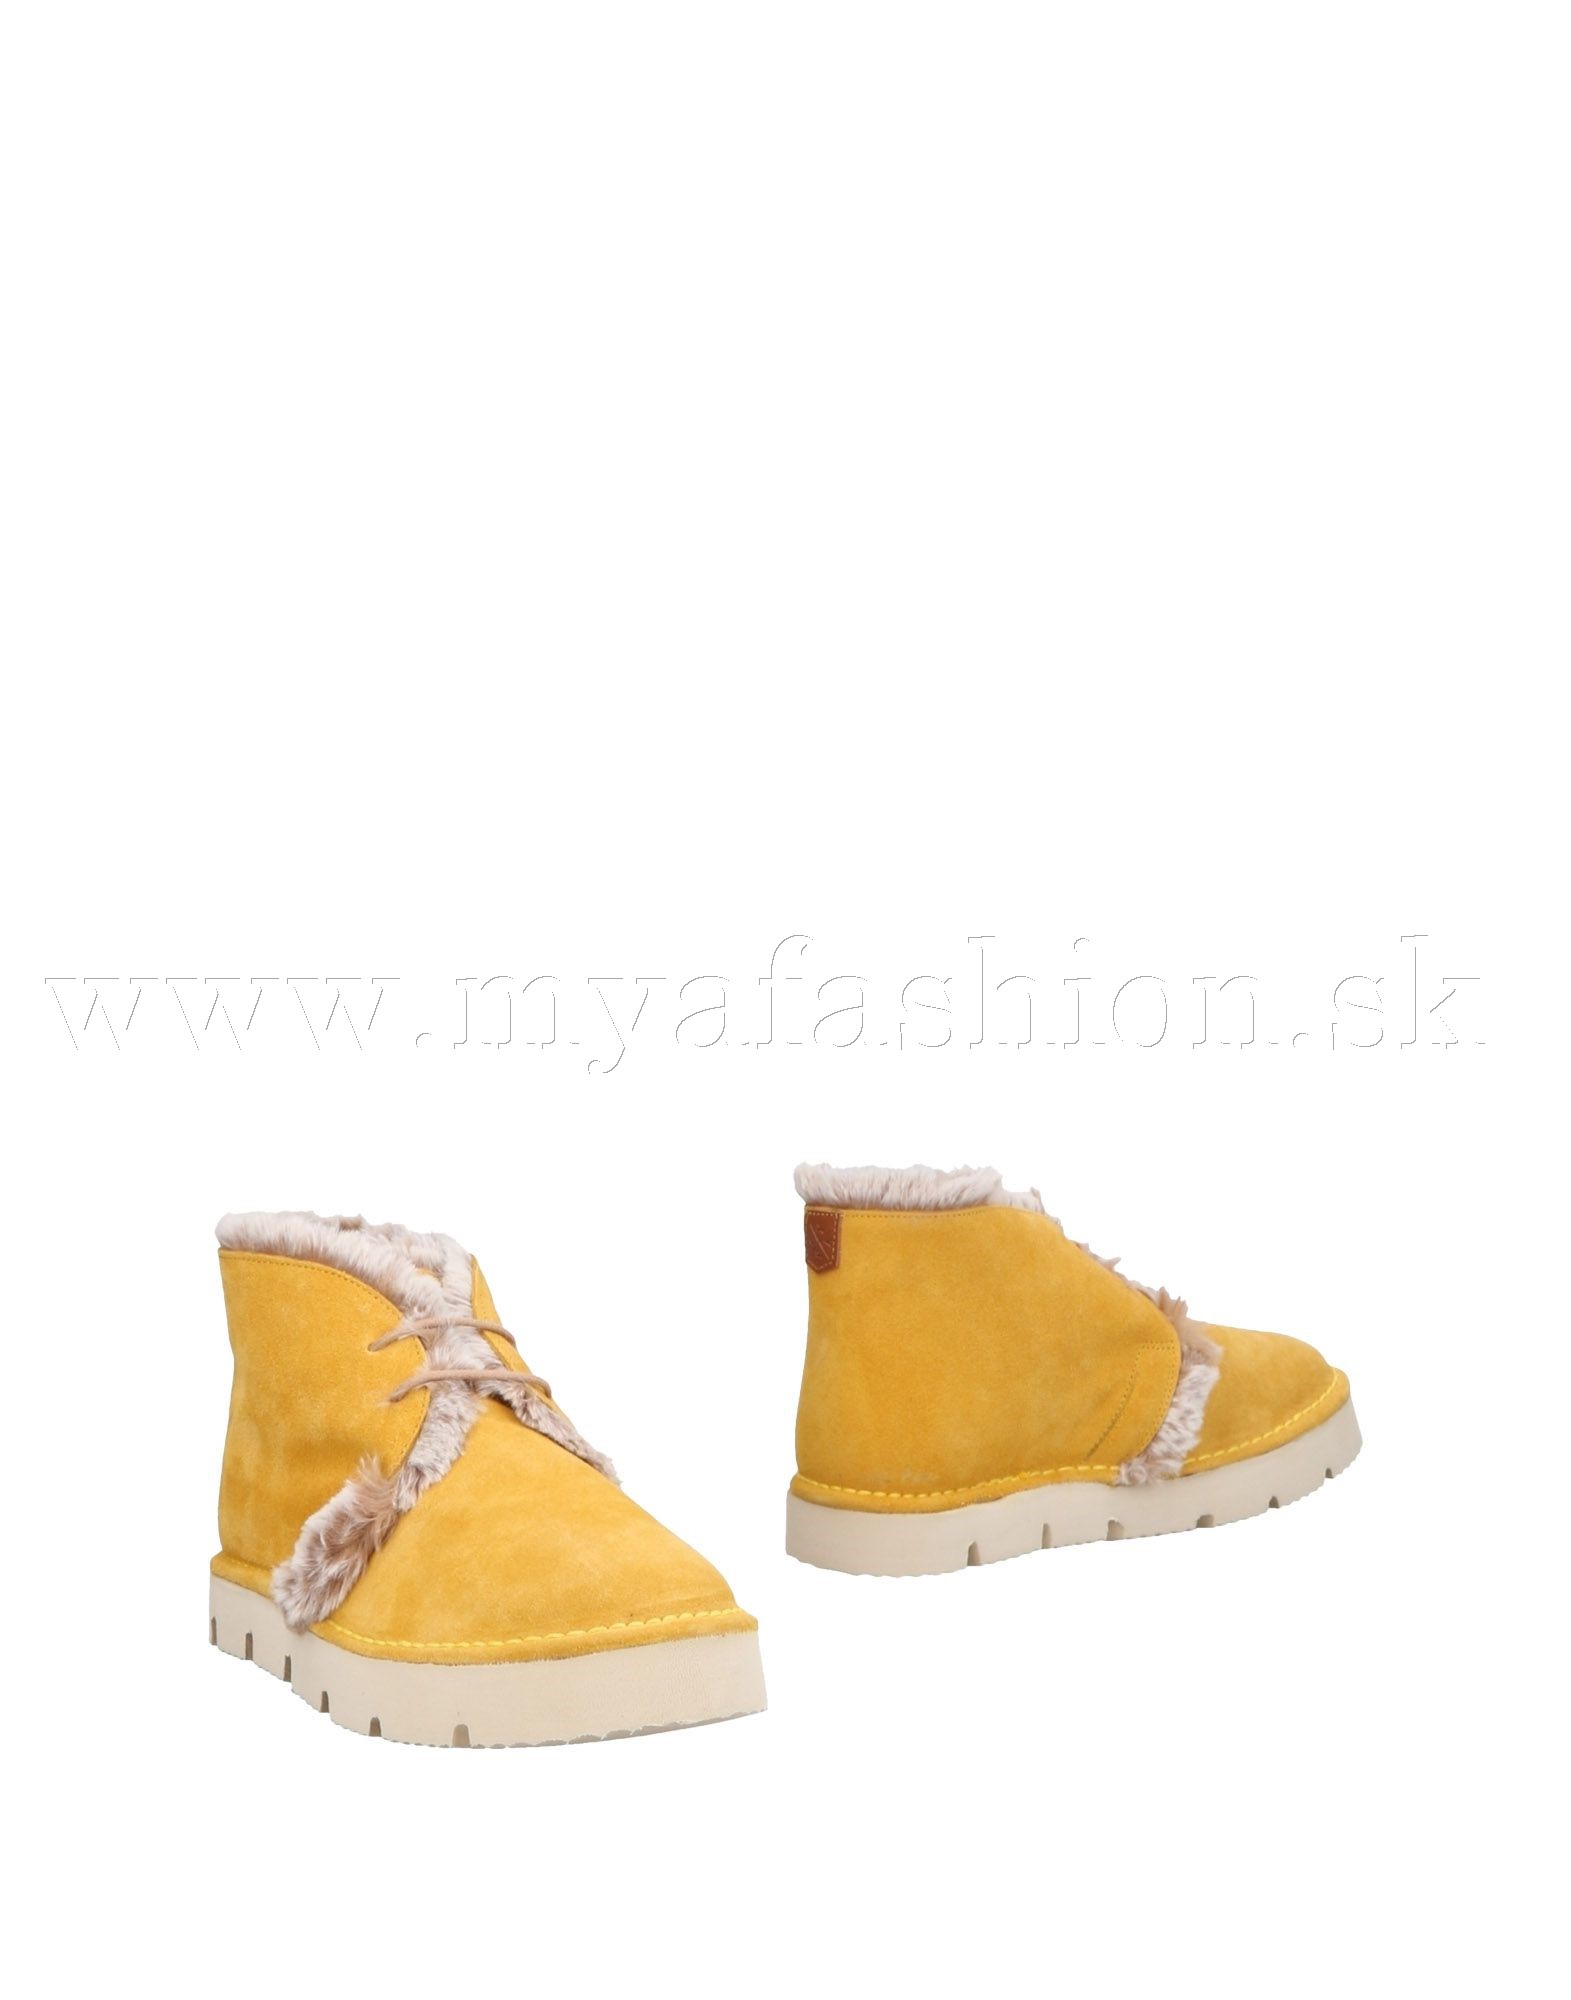 4e7ea3bbef1b Dámske topánky - dámske žlté kožušinové členkové topánky